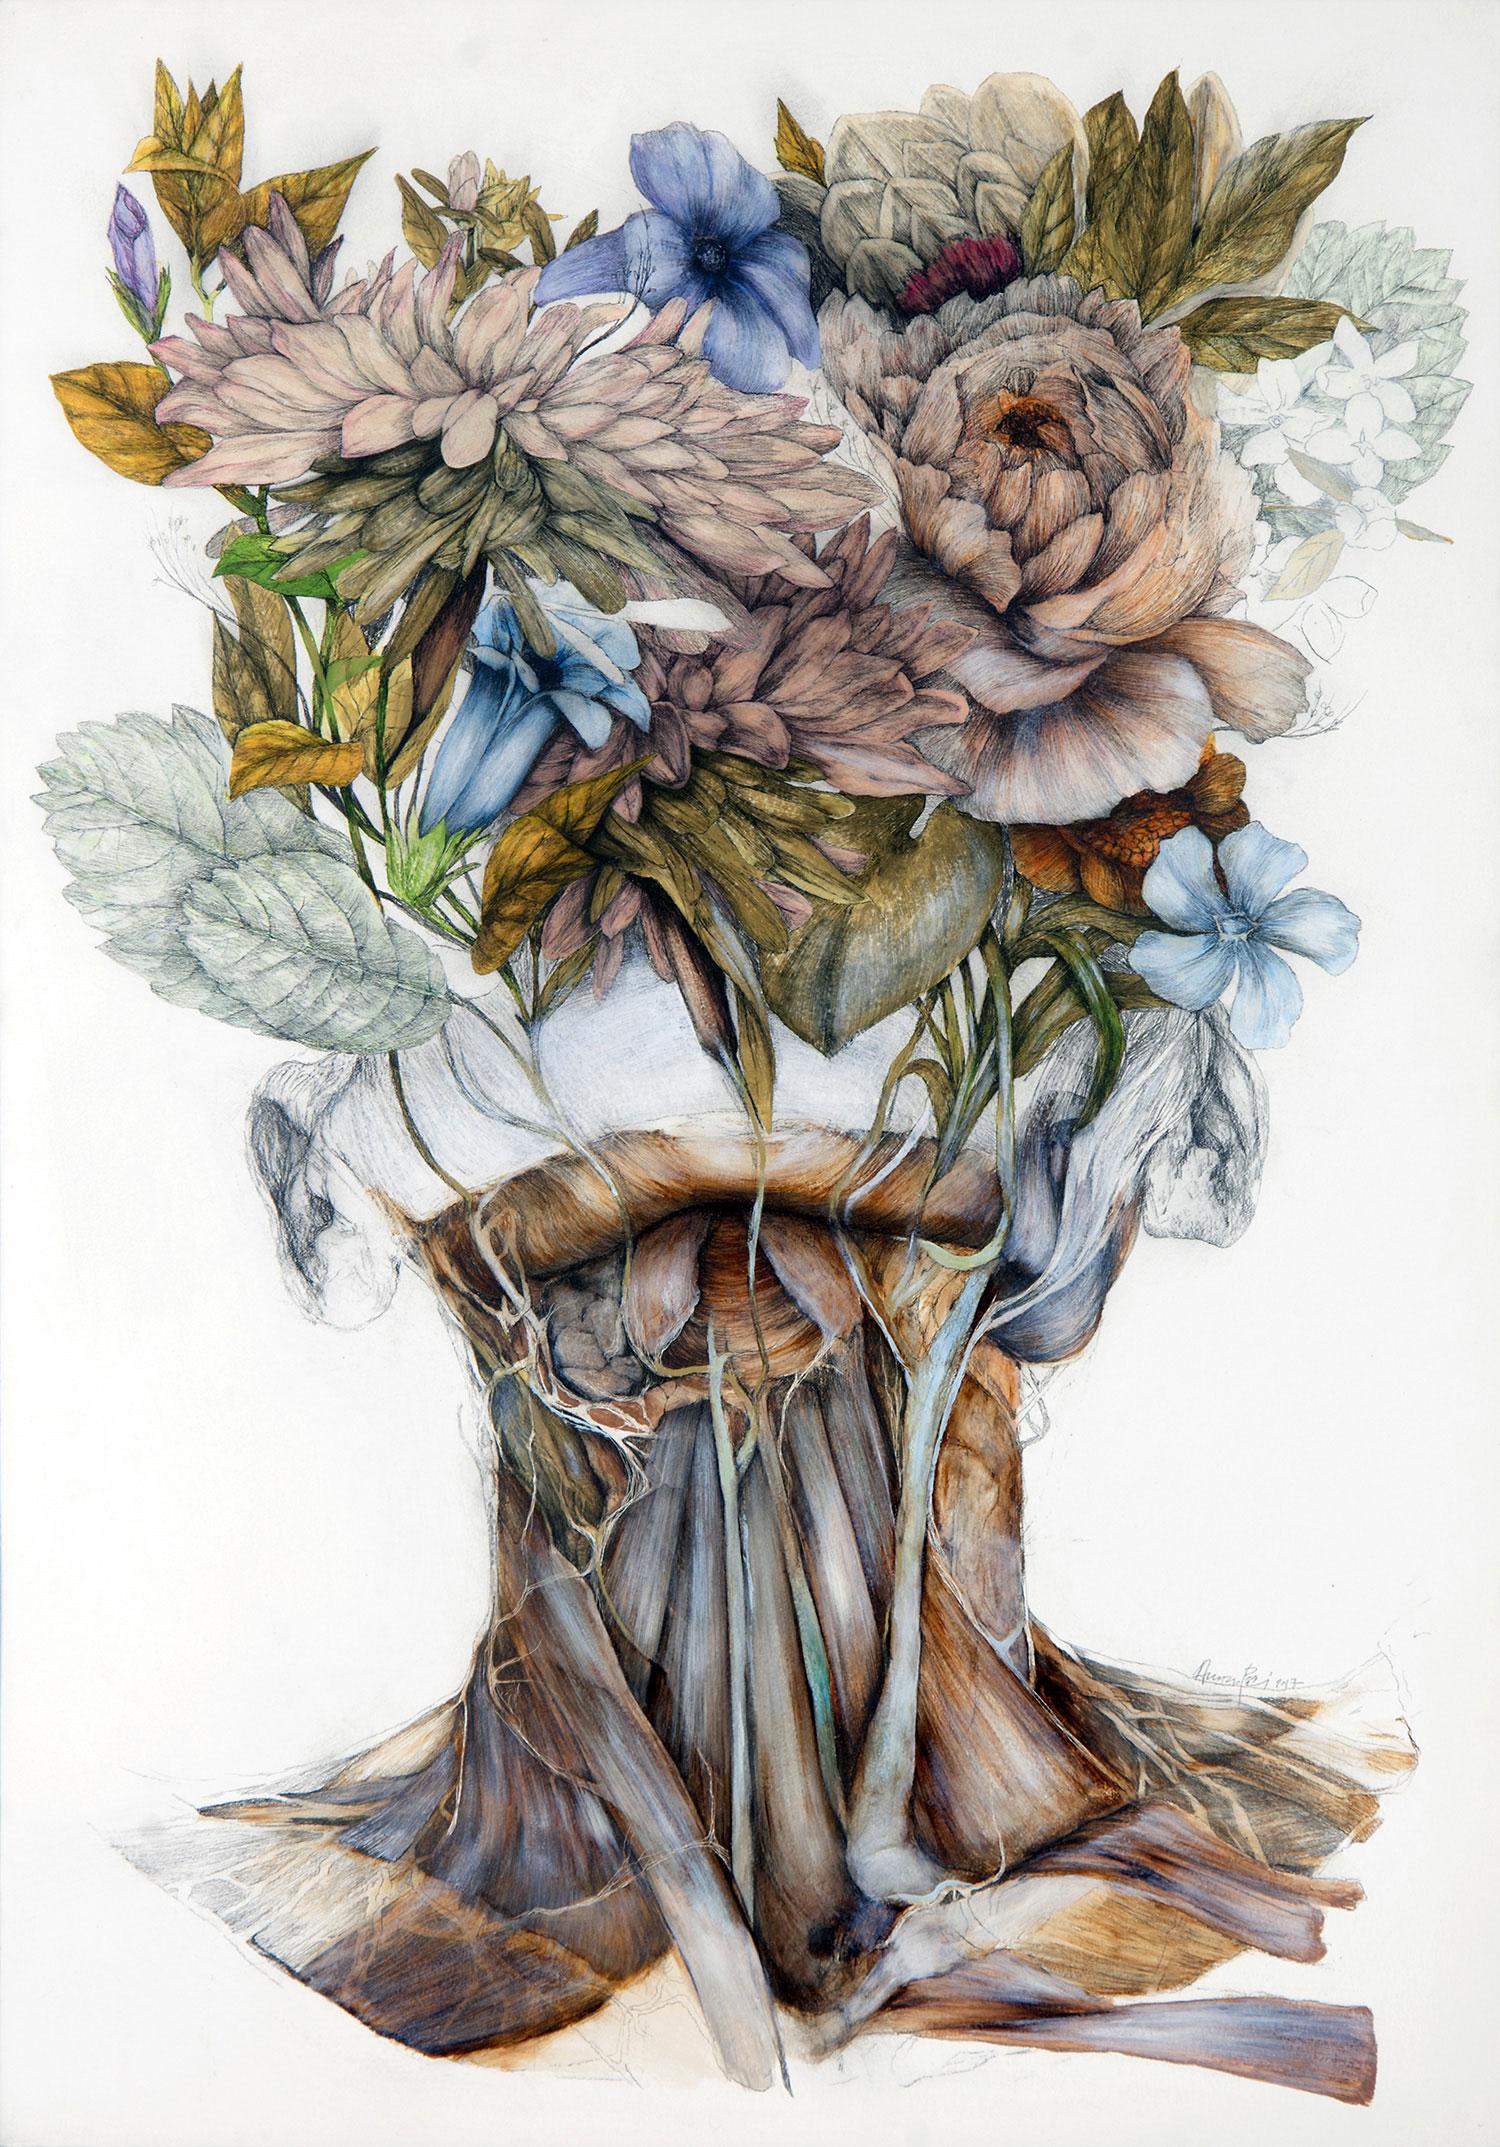 Nunzio Paci - Anatomy of a Timeless